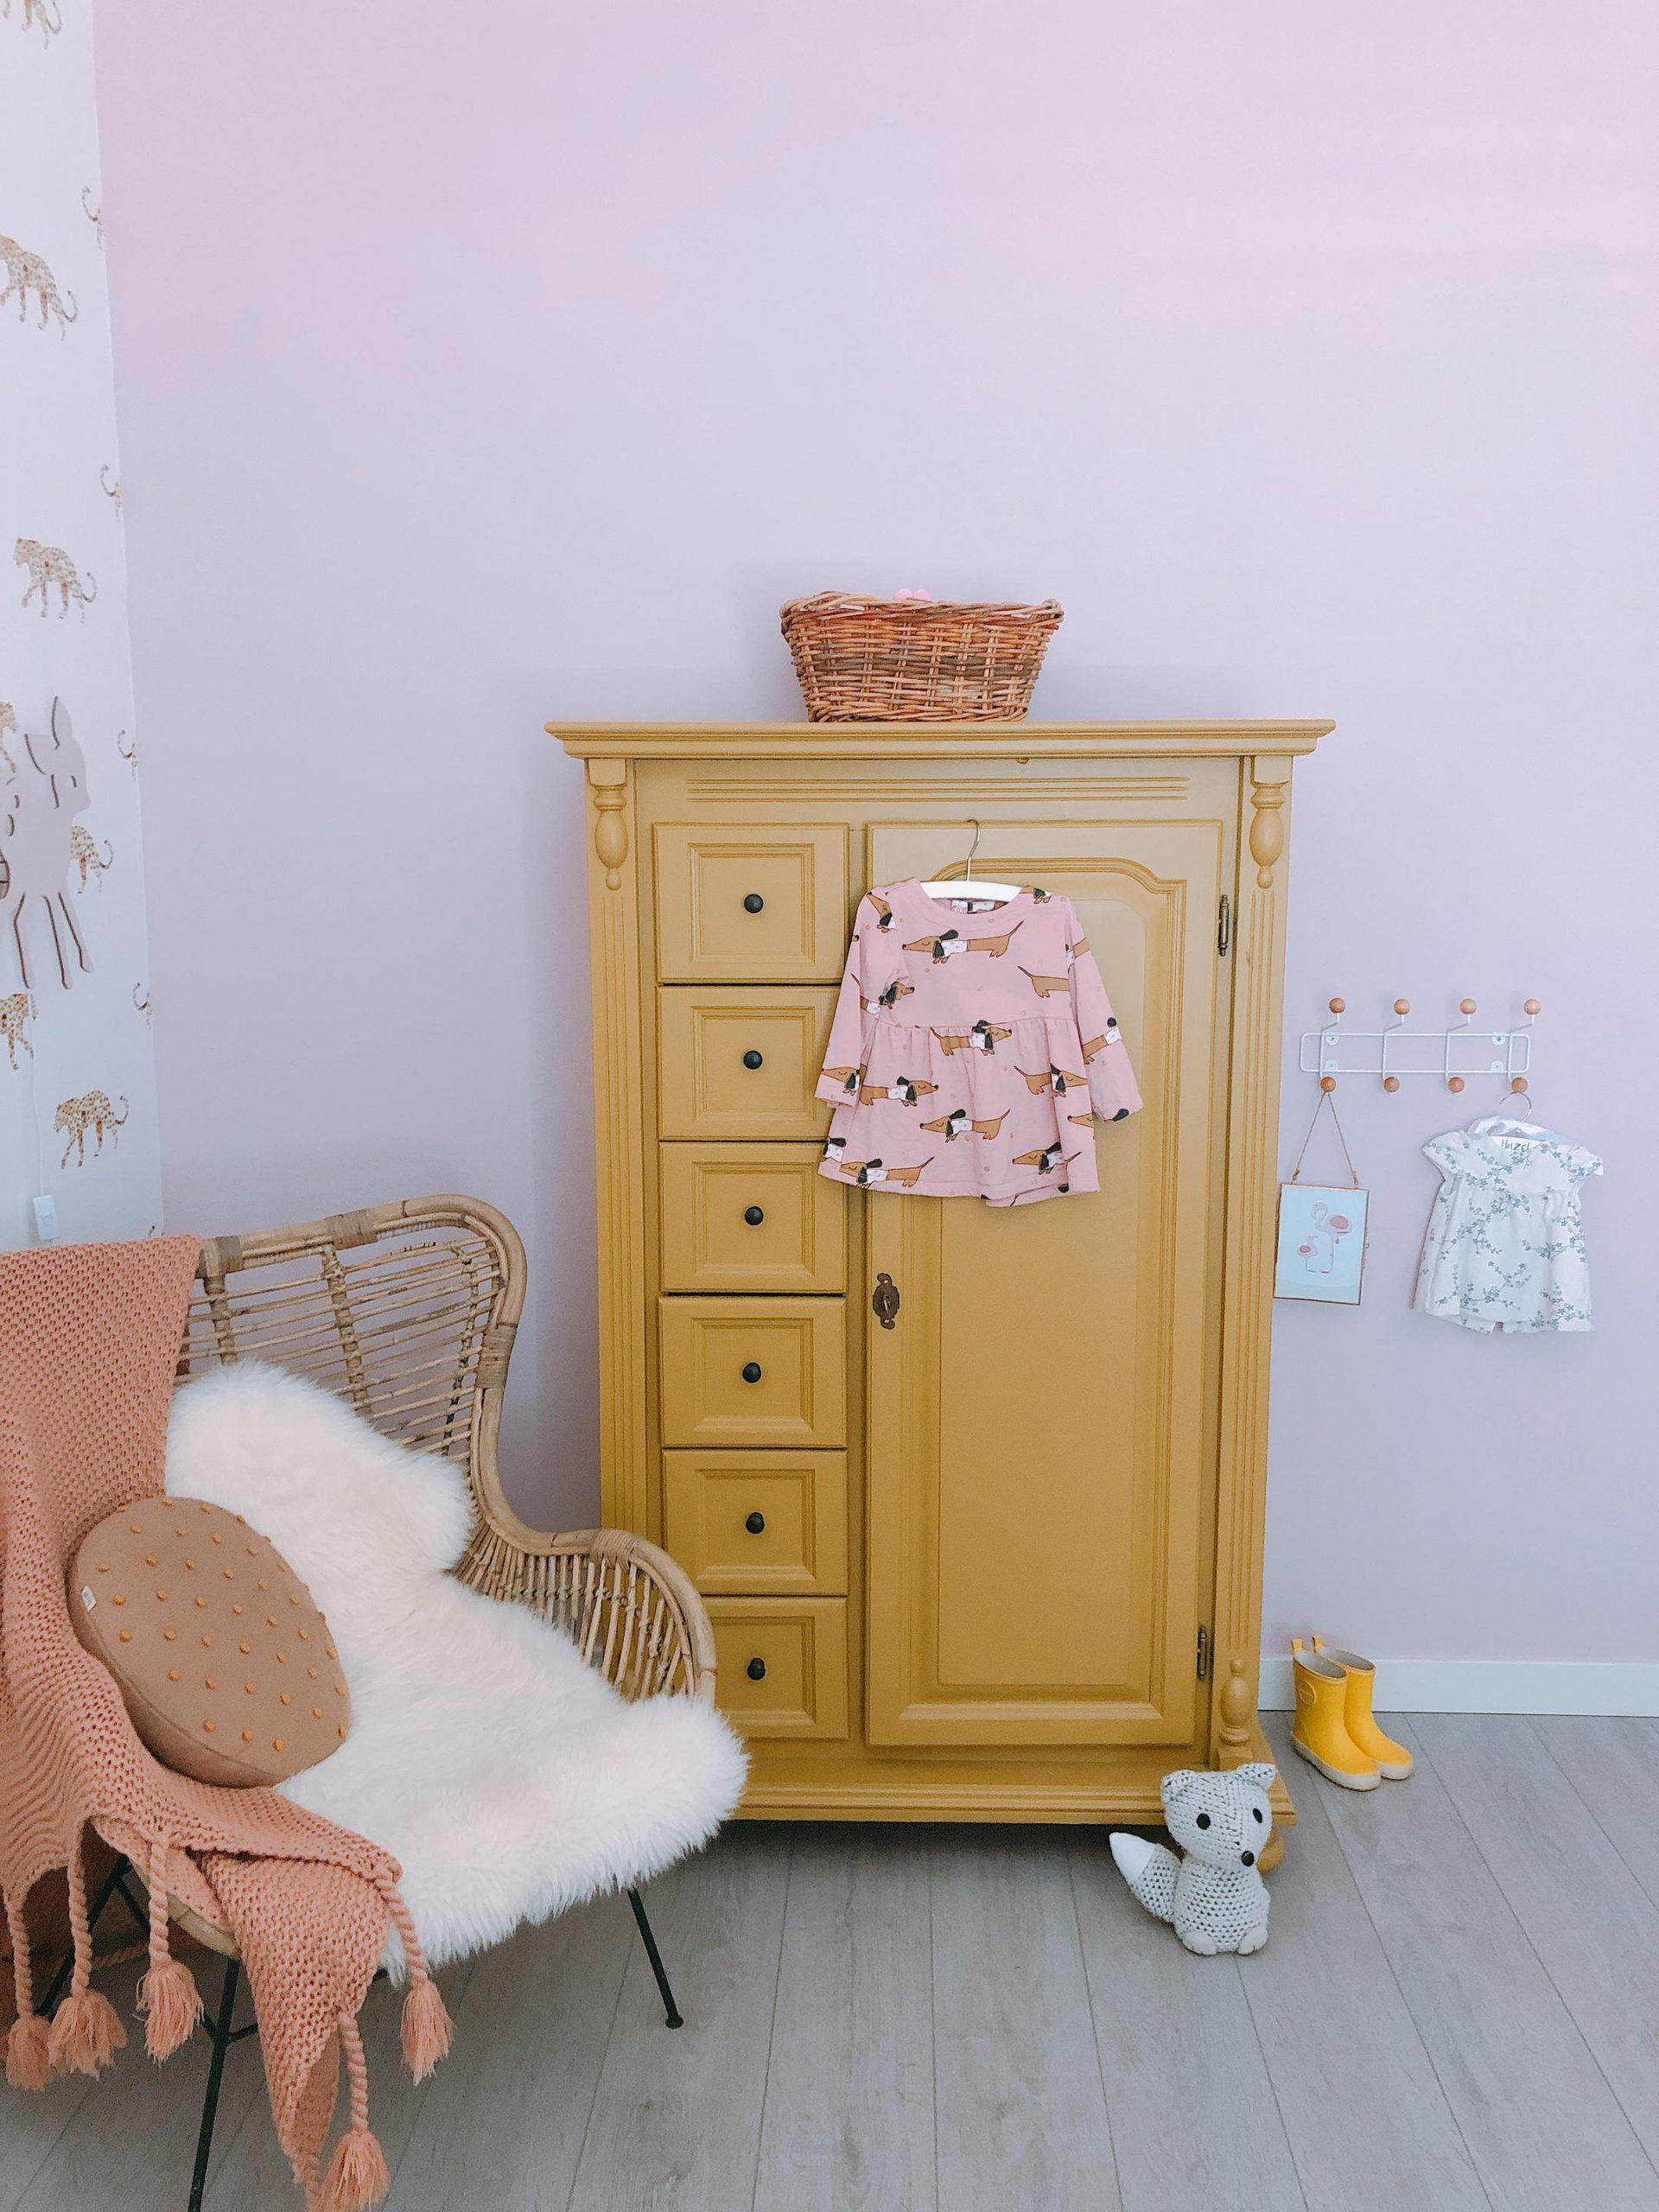 IMG 6939 2160x2880 1 scaled - De baby/kinderkamer van Hazel - roze, hout & marmer!